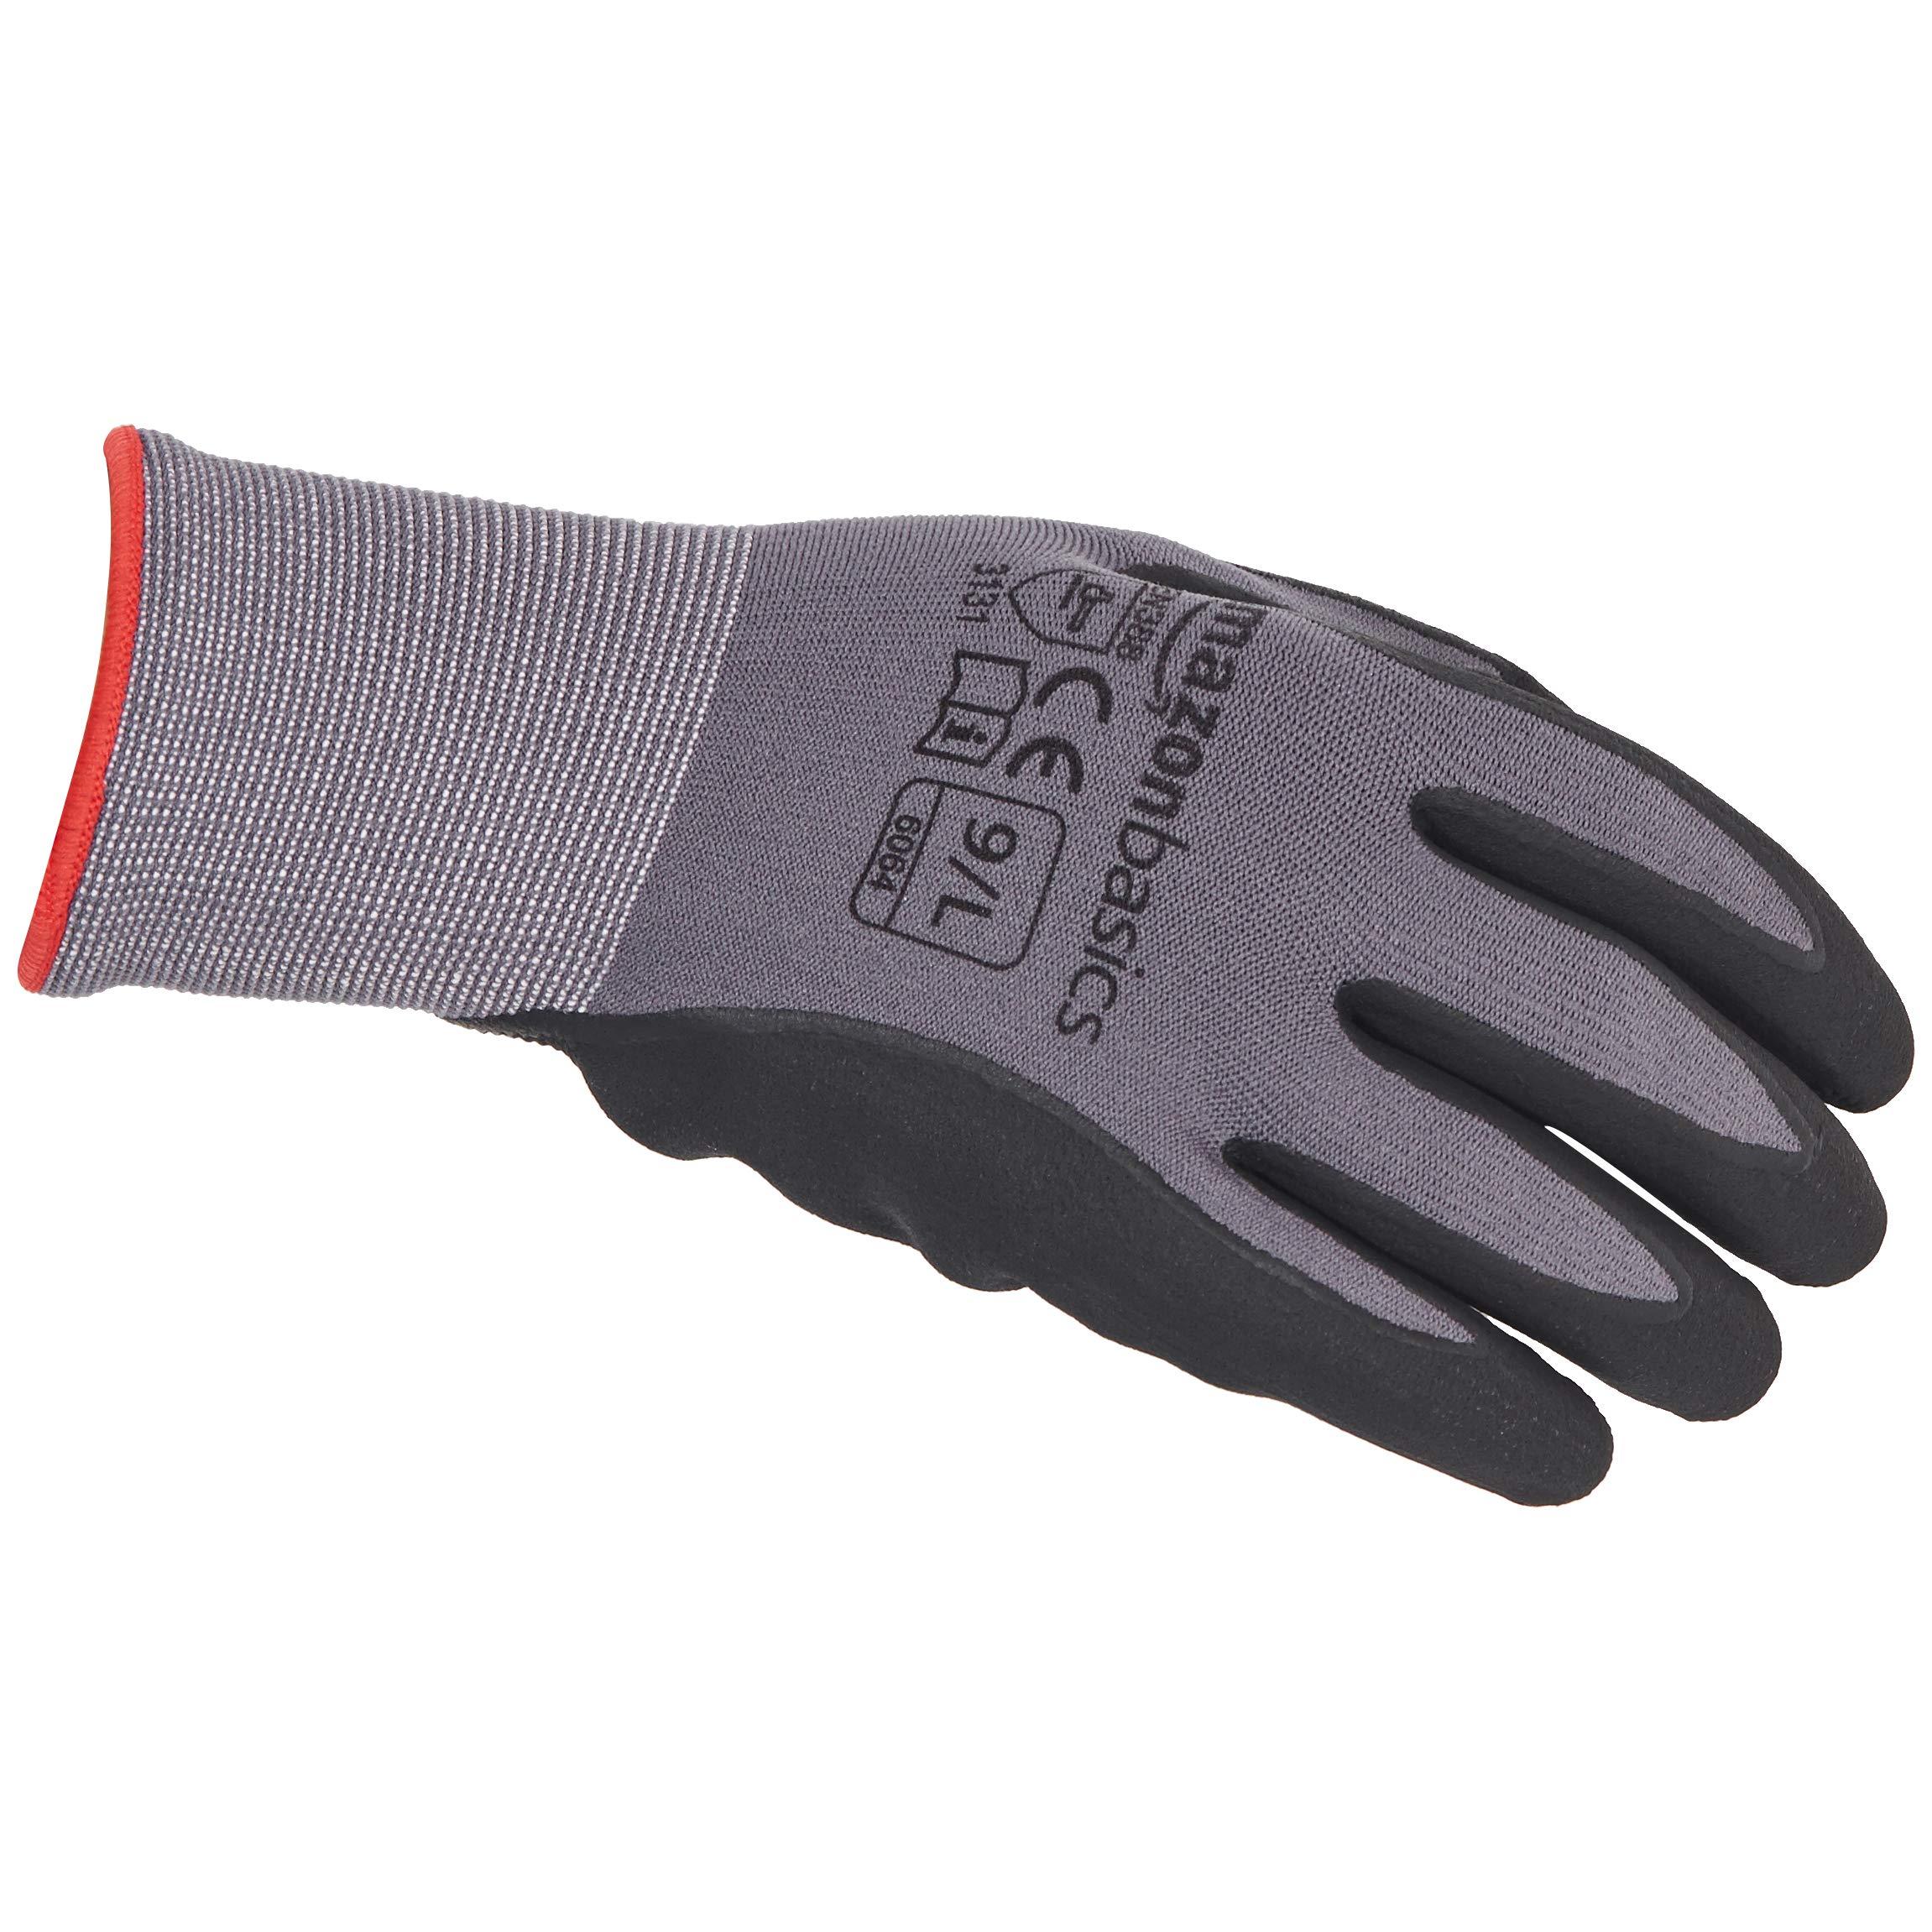 AmazonBasics Micro-Foam Nitrile Coated Work Gloves, Nylon Liner Fiber, Touch Screen, Grey, Size 9, L, 12-Pair by AmazonBasics (Image #3)